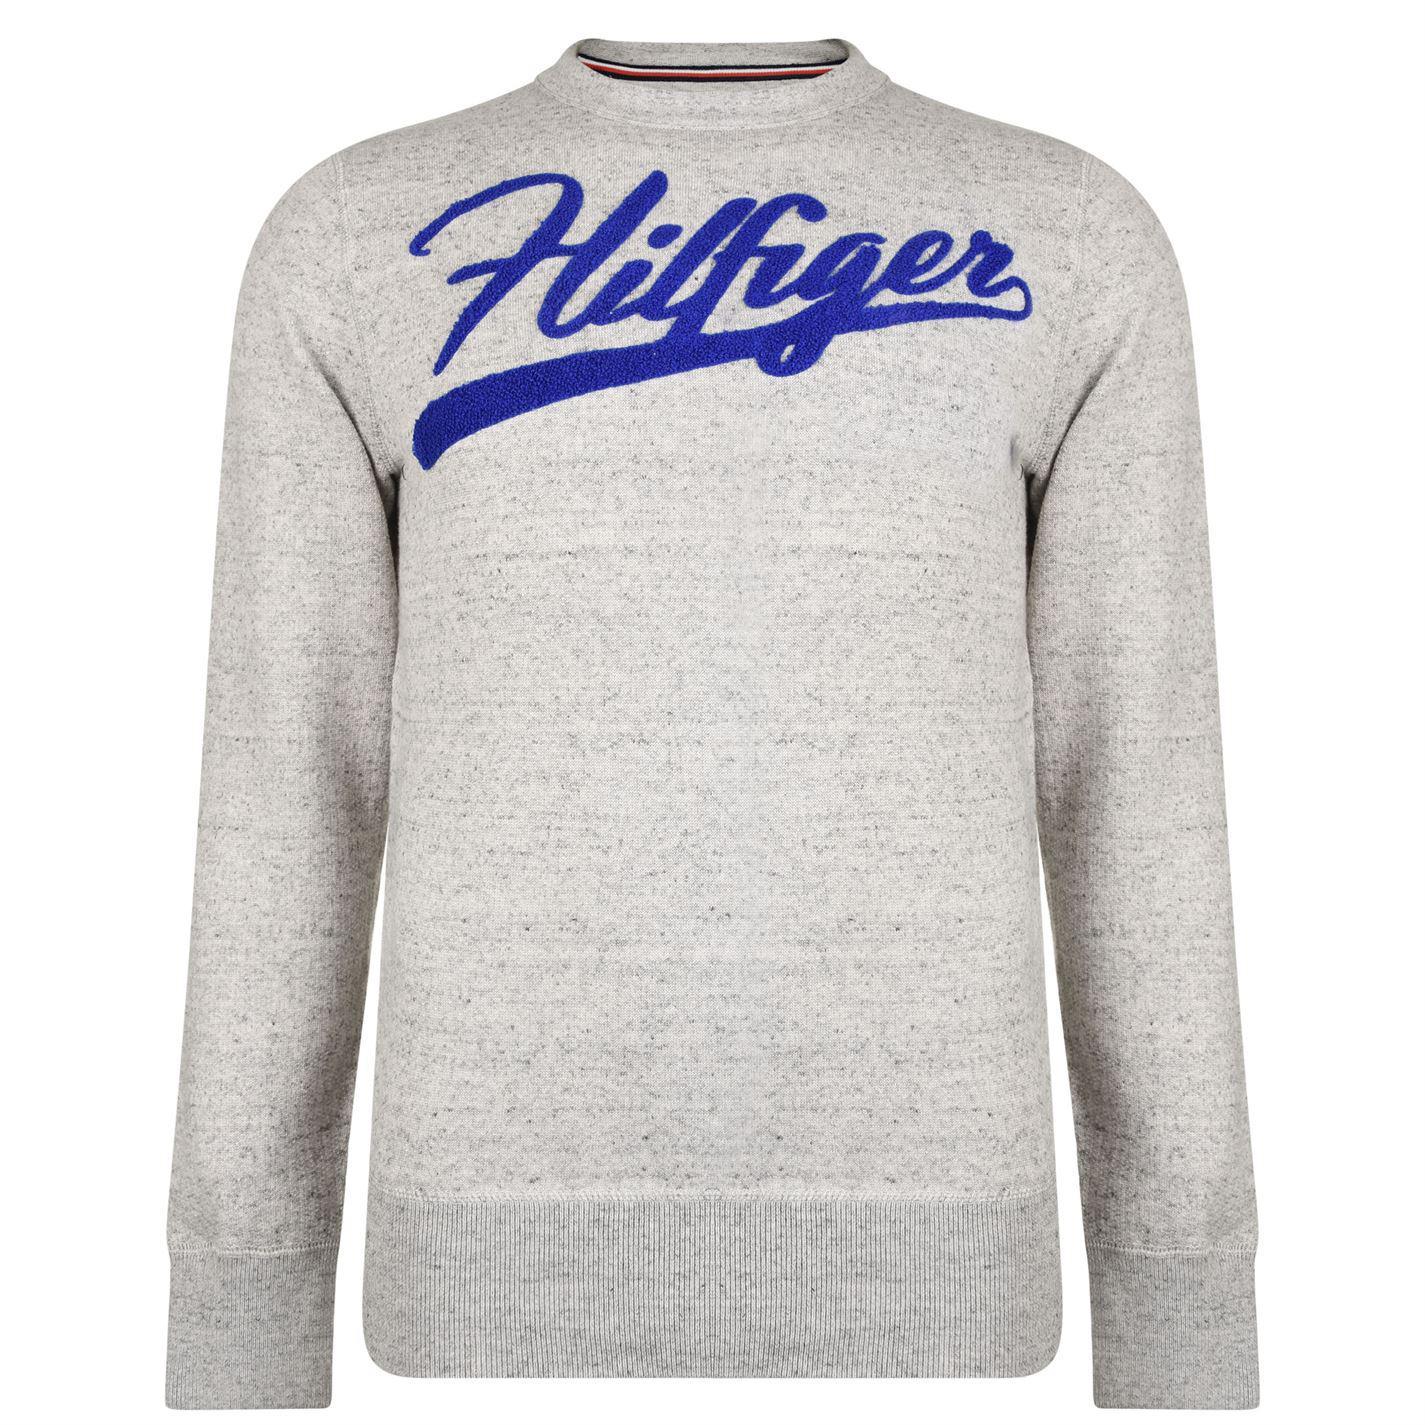 c39cc44fcde7 Lyst - Tommy Hilfiger Iggy Sweatshirt in Gray for Men